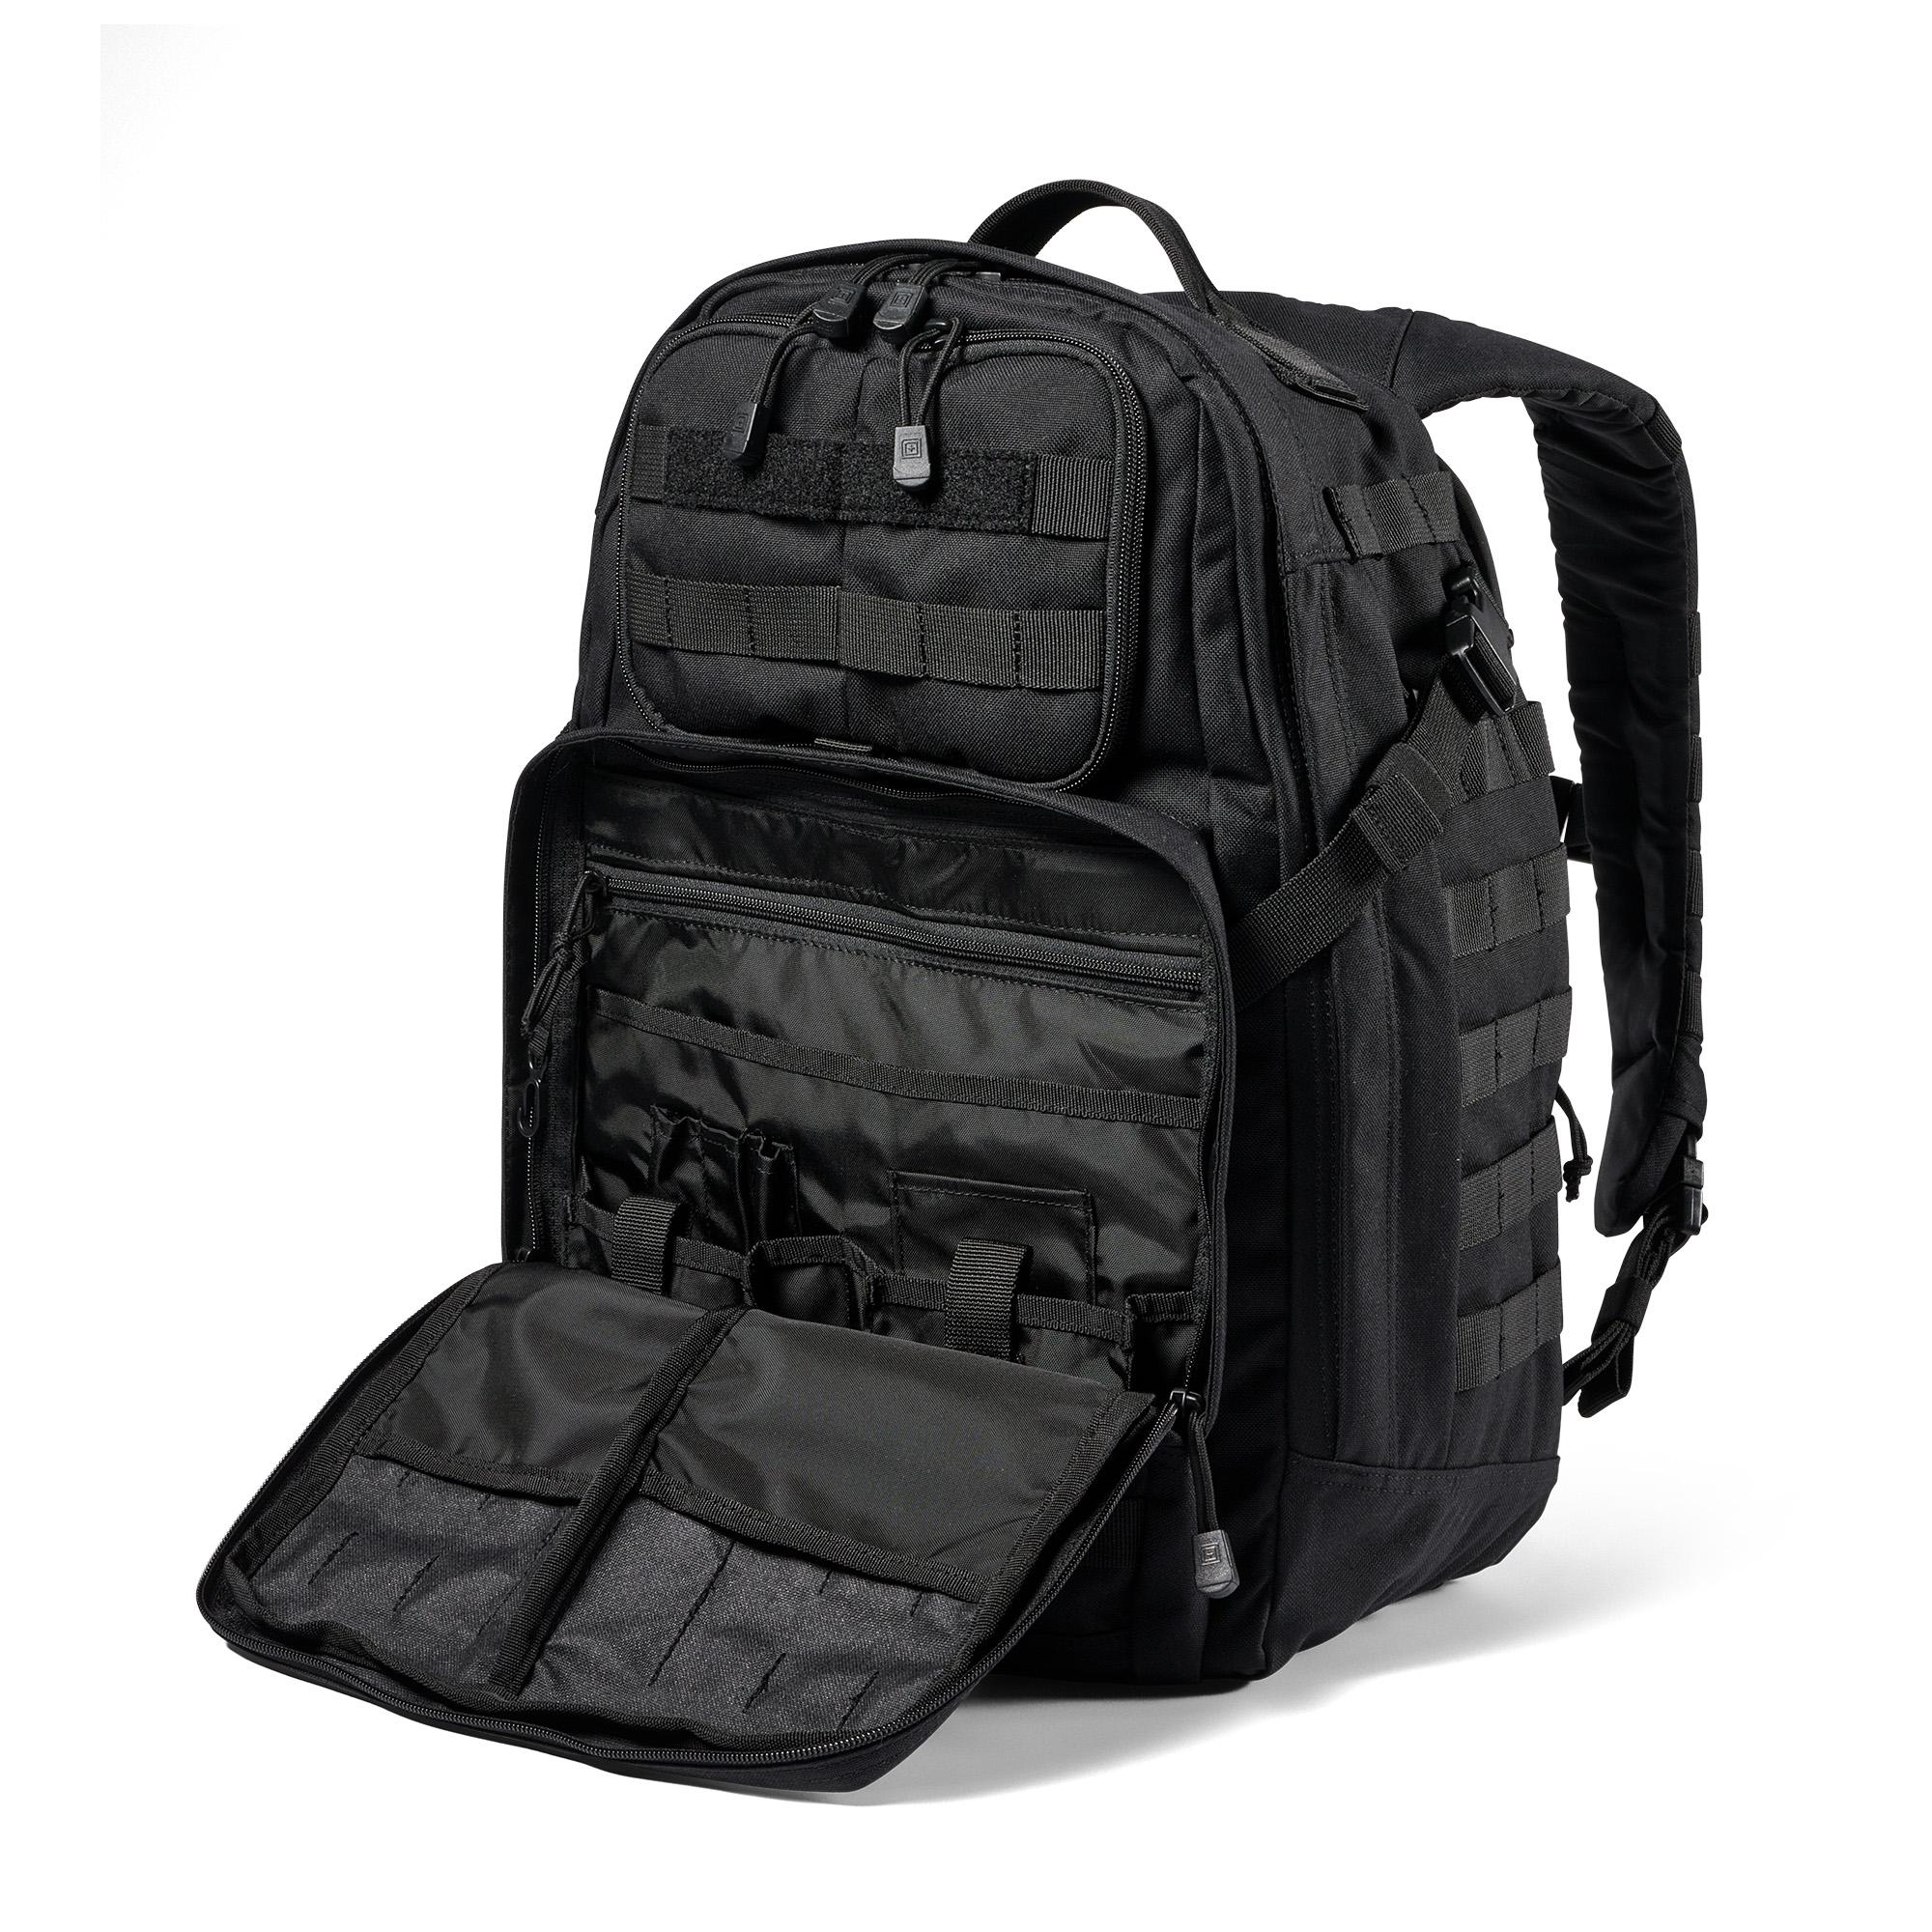 Balo 5.11 Tactical Rush 24 2.0 – Black